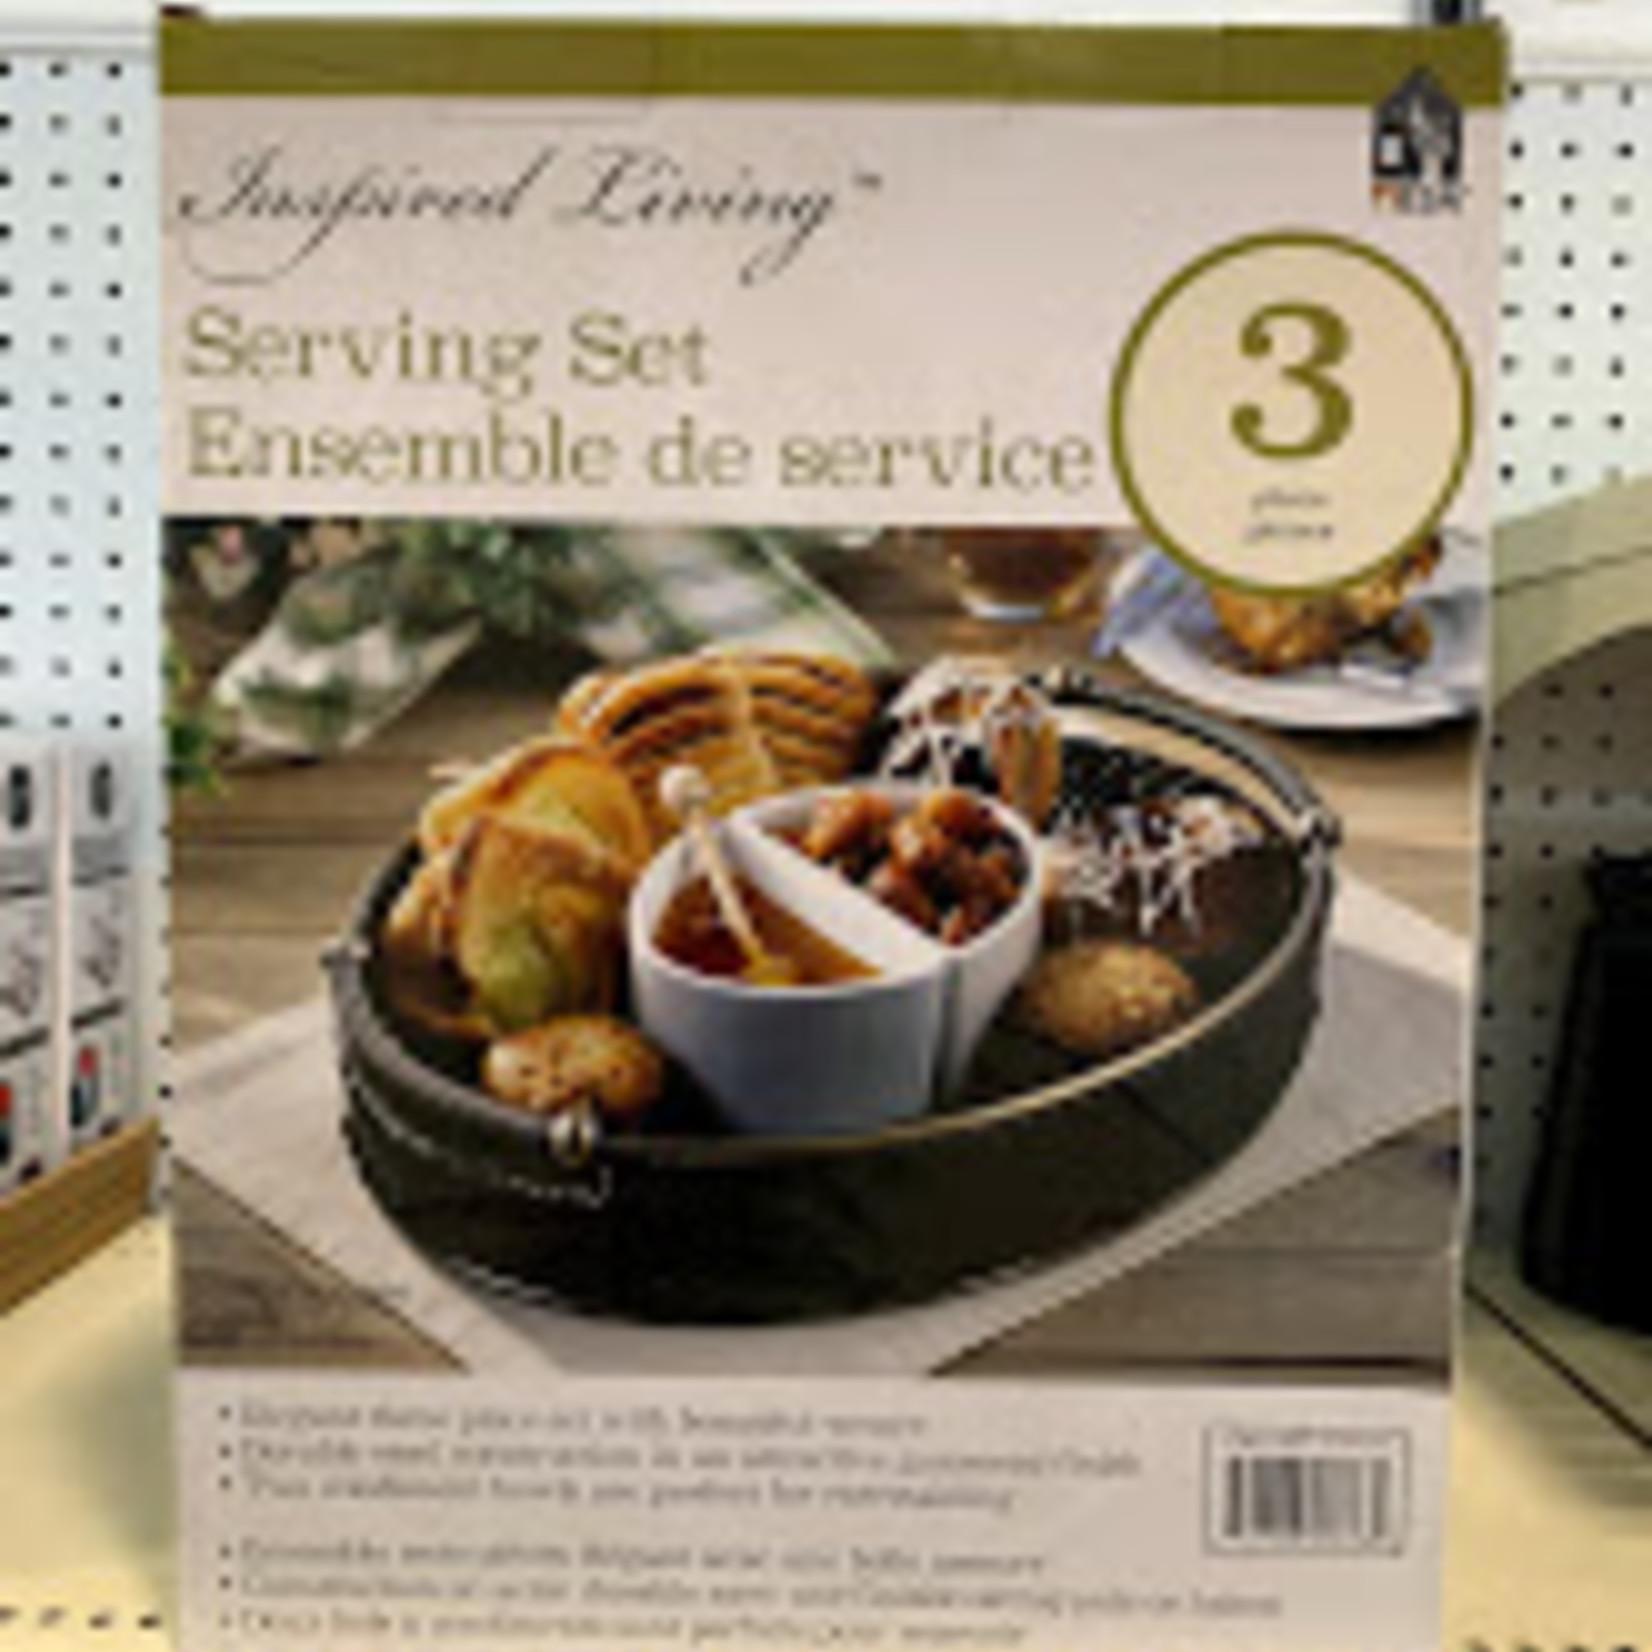 Inspired Living Serving Set 3 pc